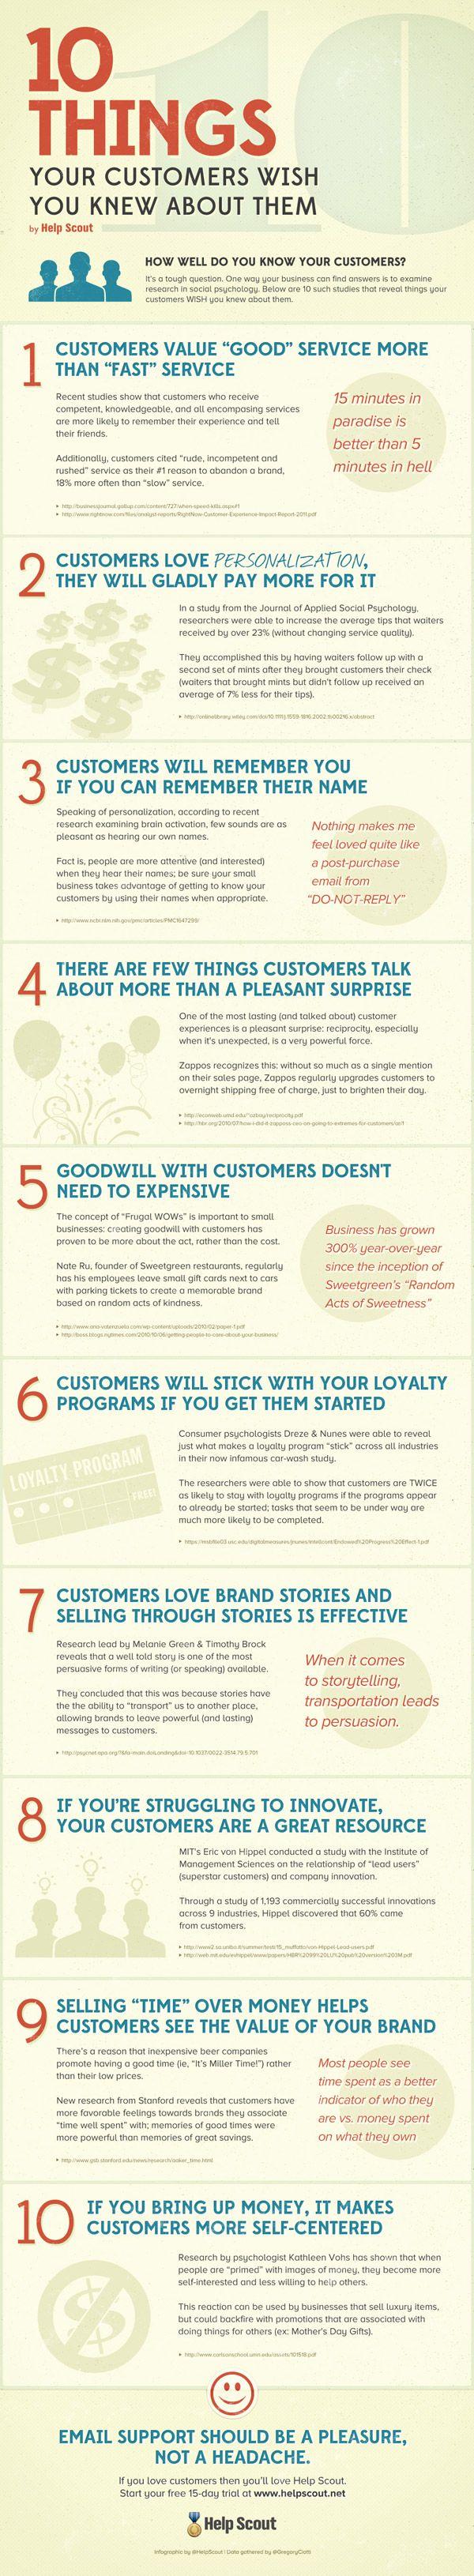 10 cosas que debes conocer sobre tus clientes #infografia #infographic #marketing